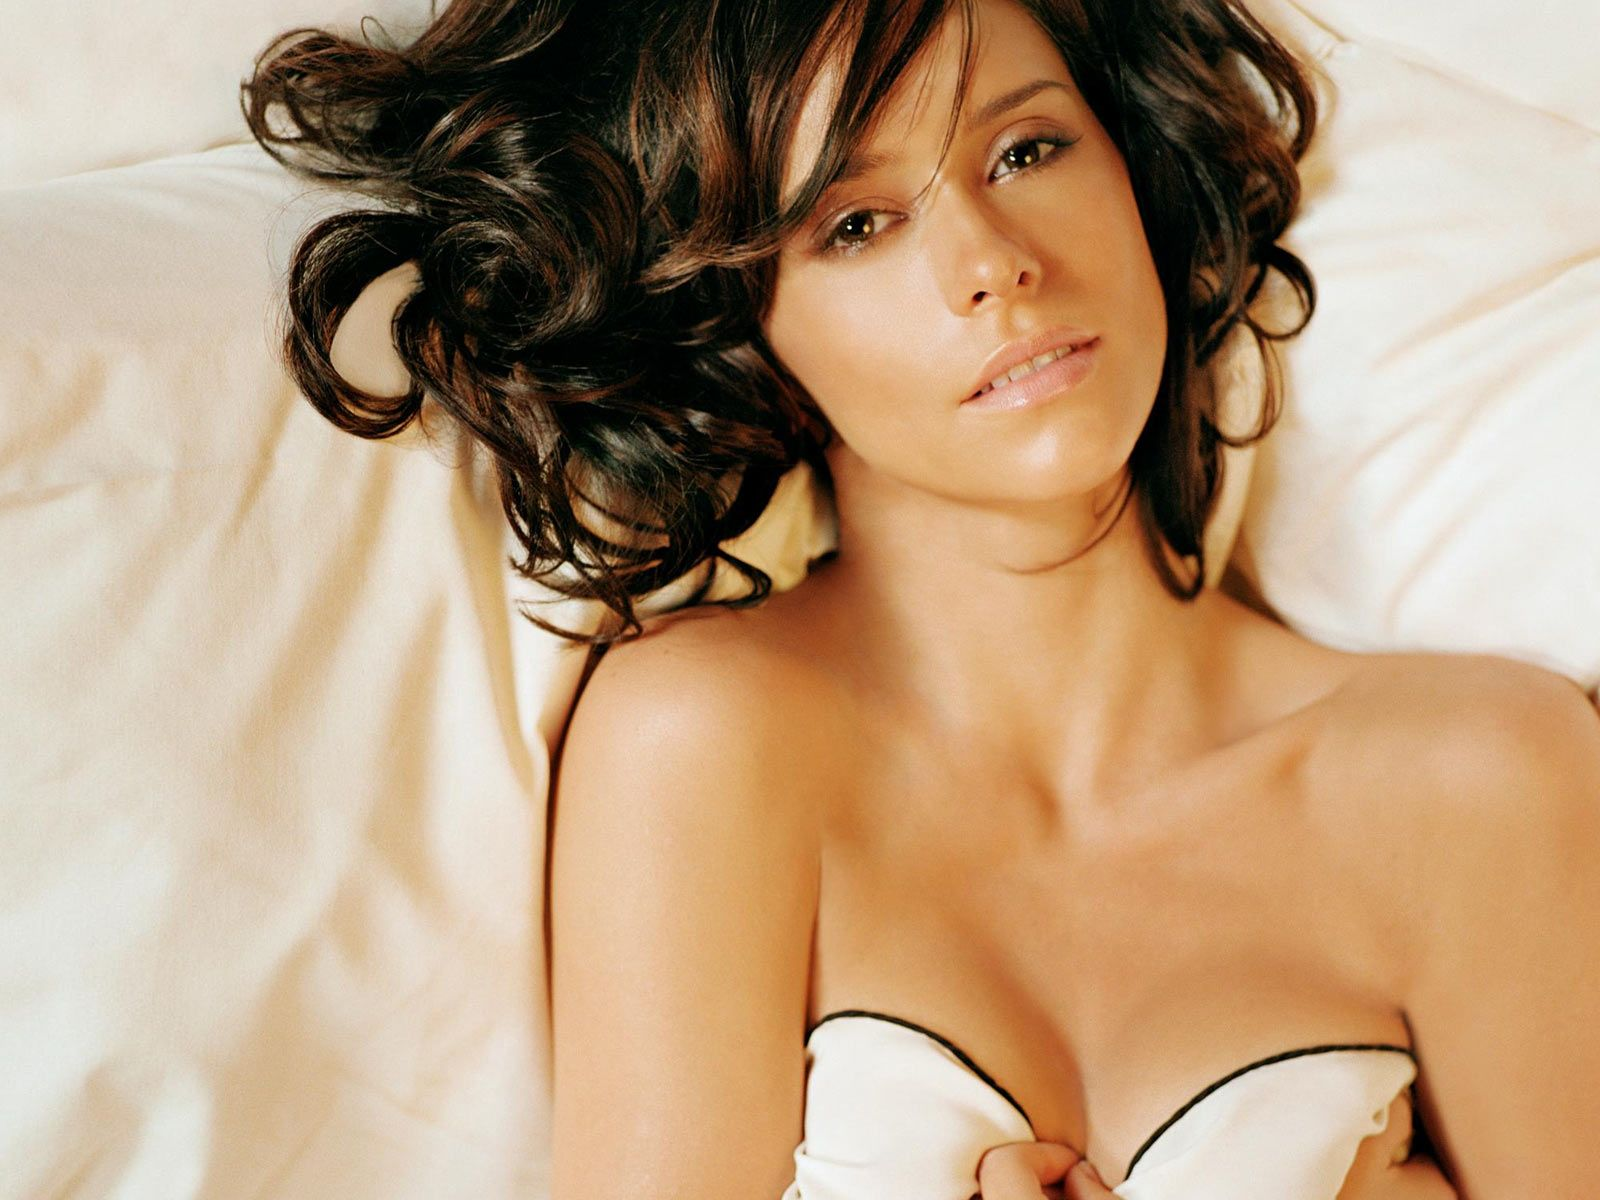 Jennifer Love Hewitt Pornofilme YouPorncom